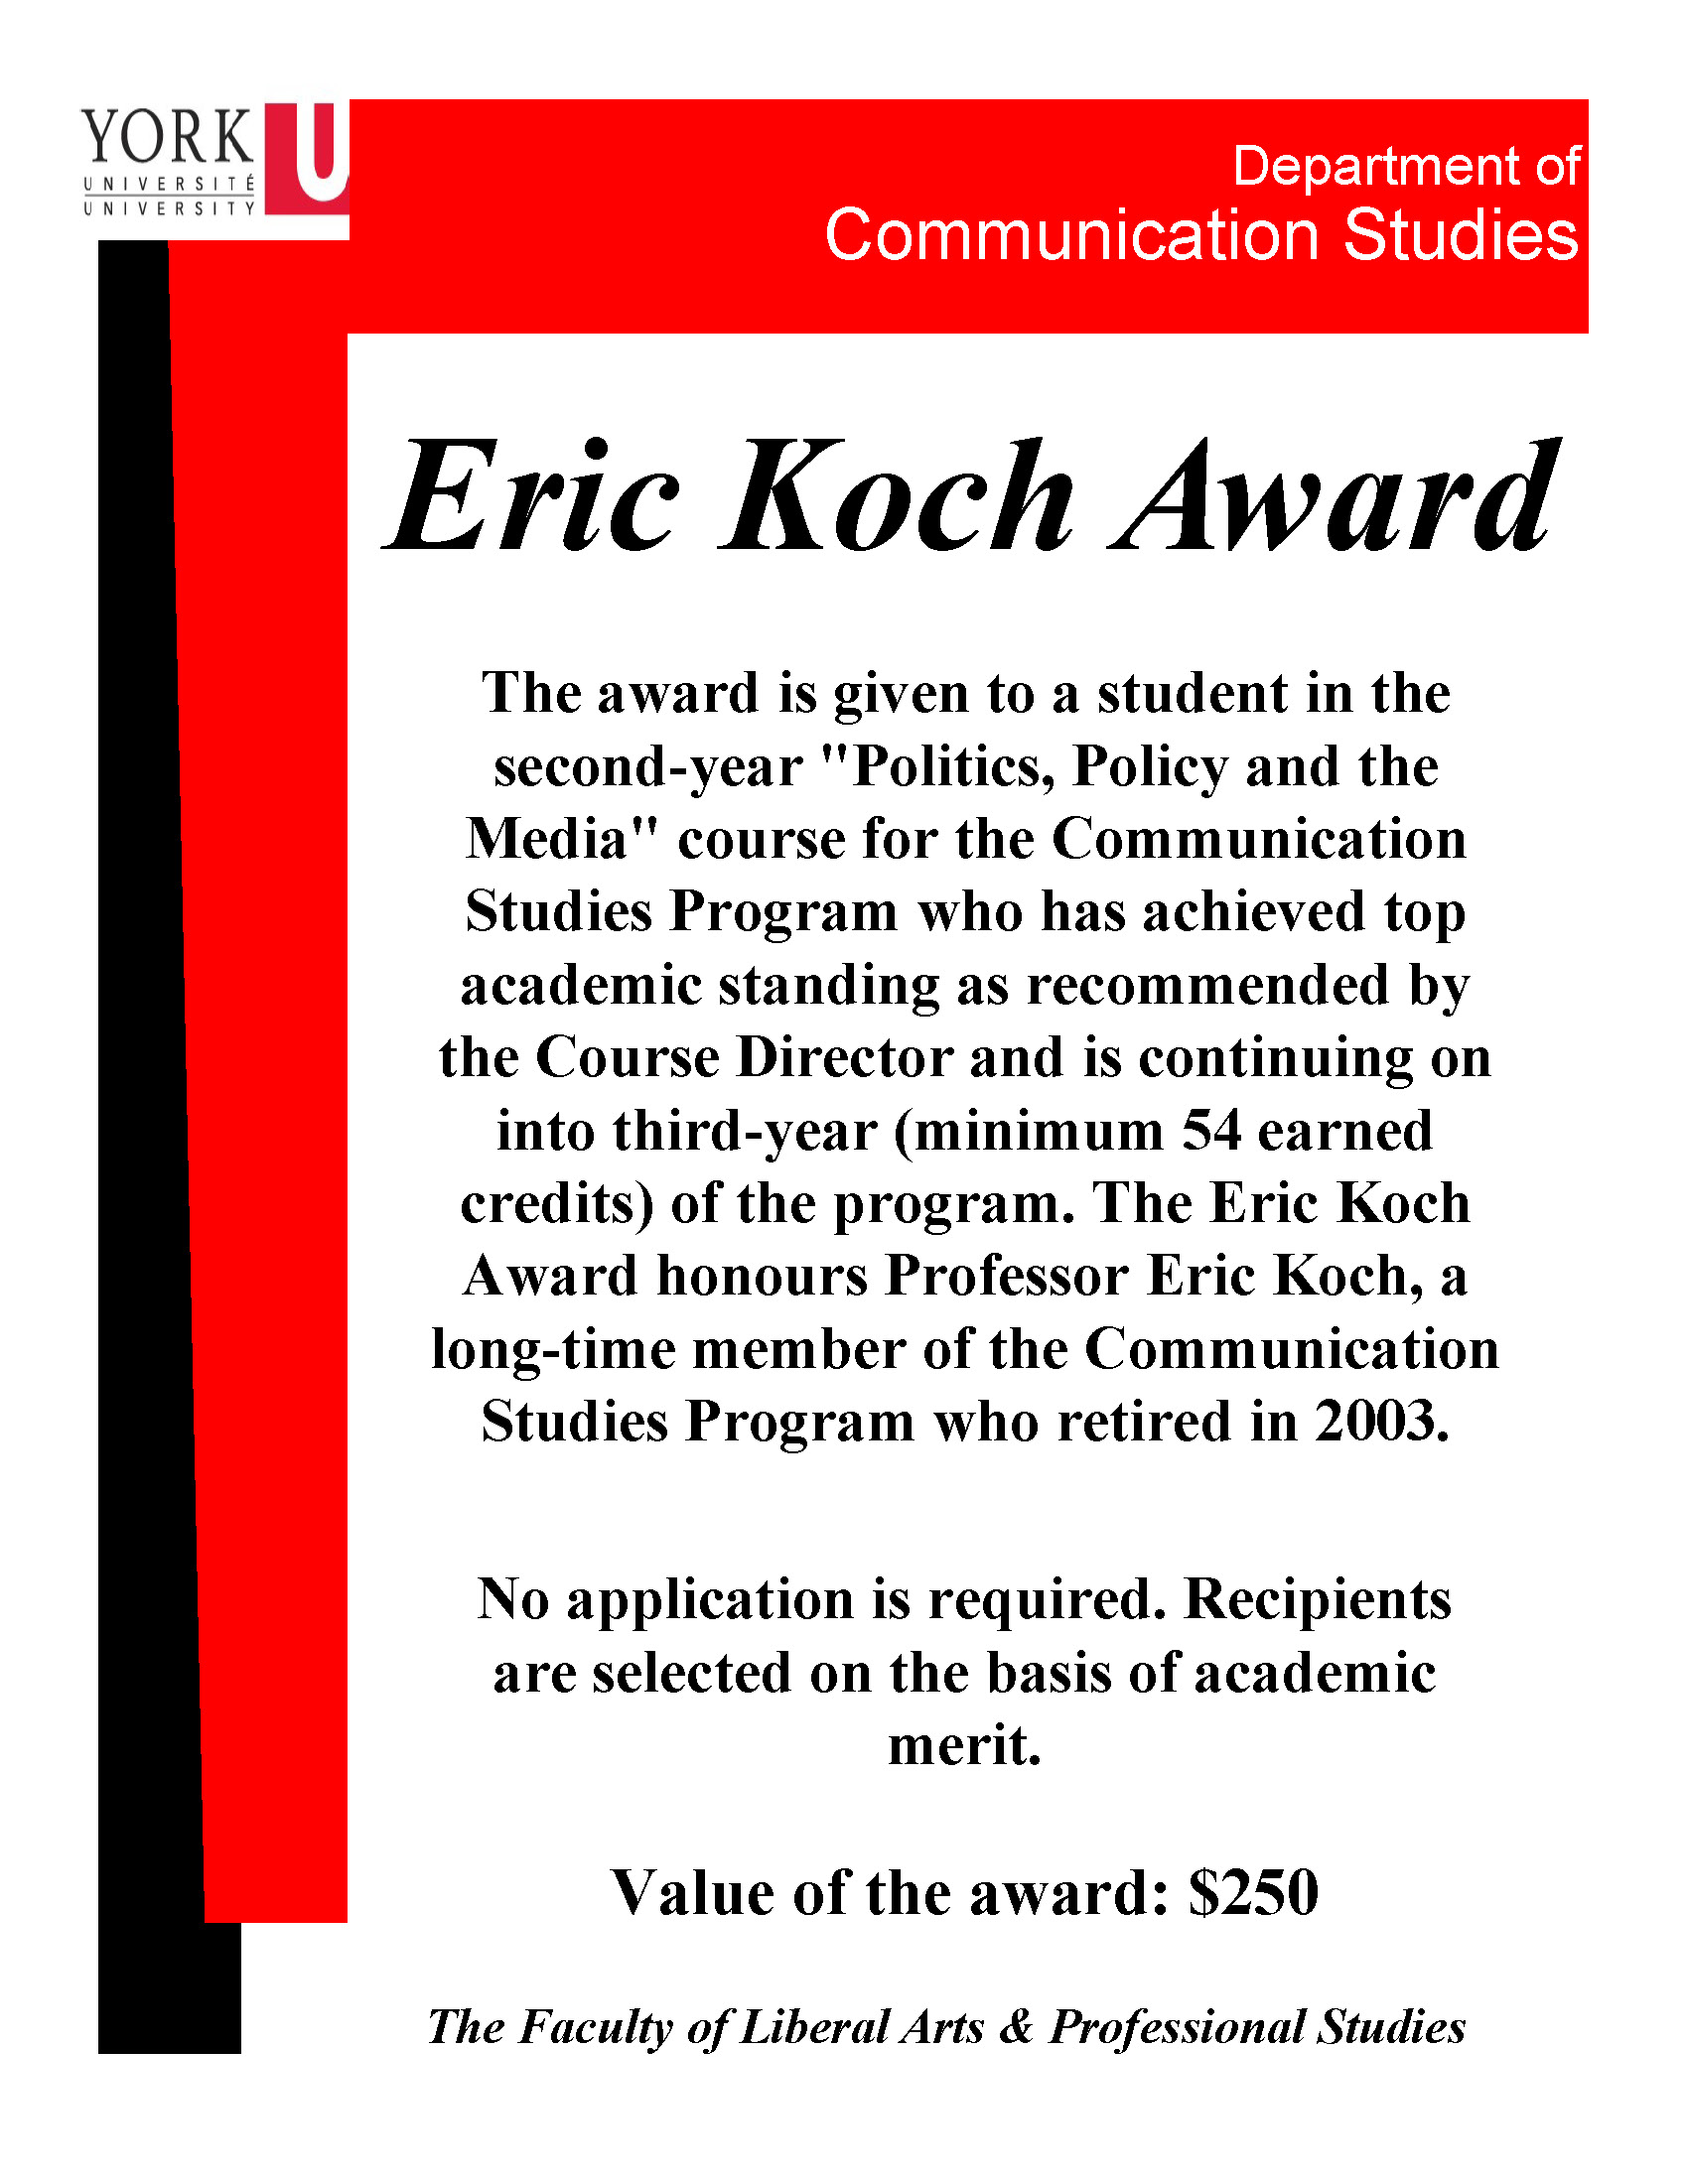 Eric Koch Award